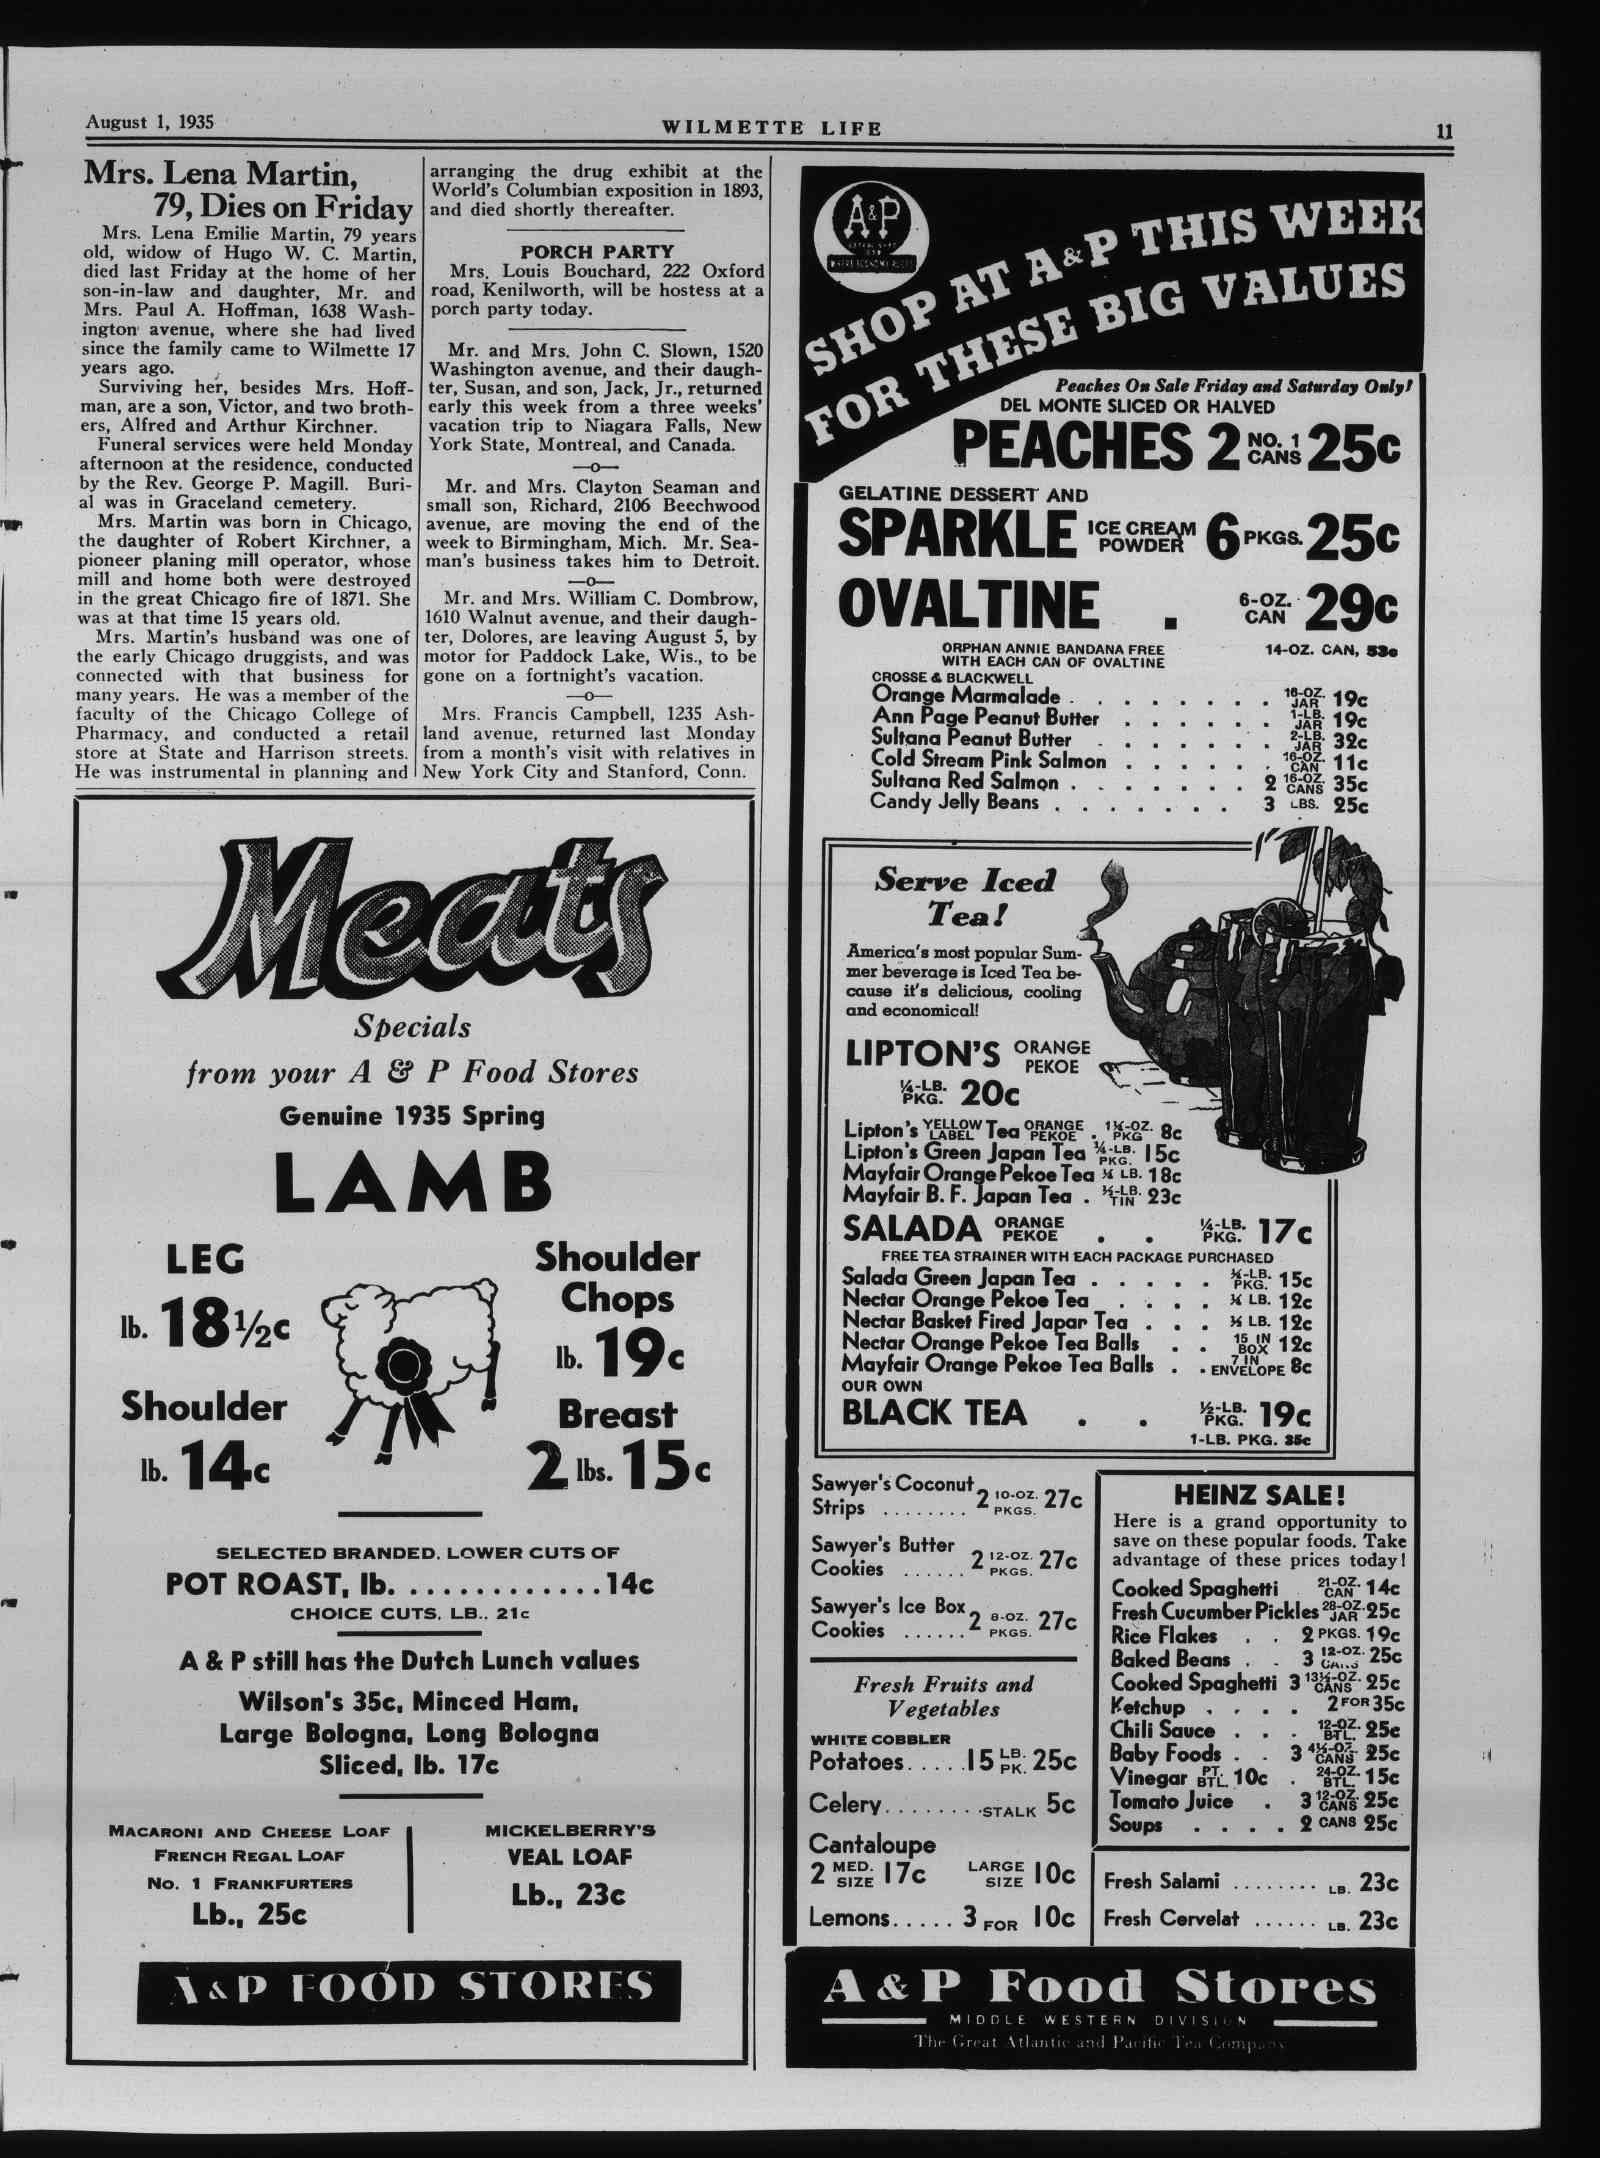 Wilmette Life (Wilmette, Illinois), 1 Aug 1935